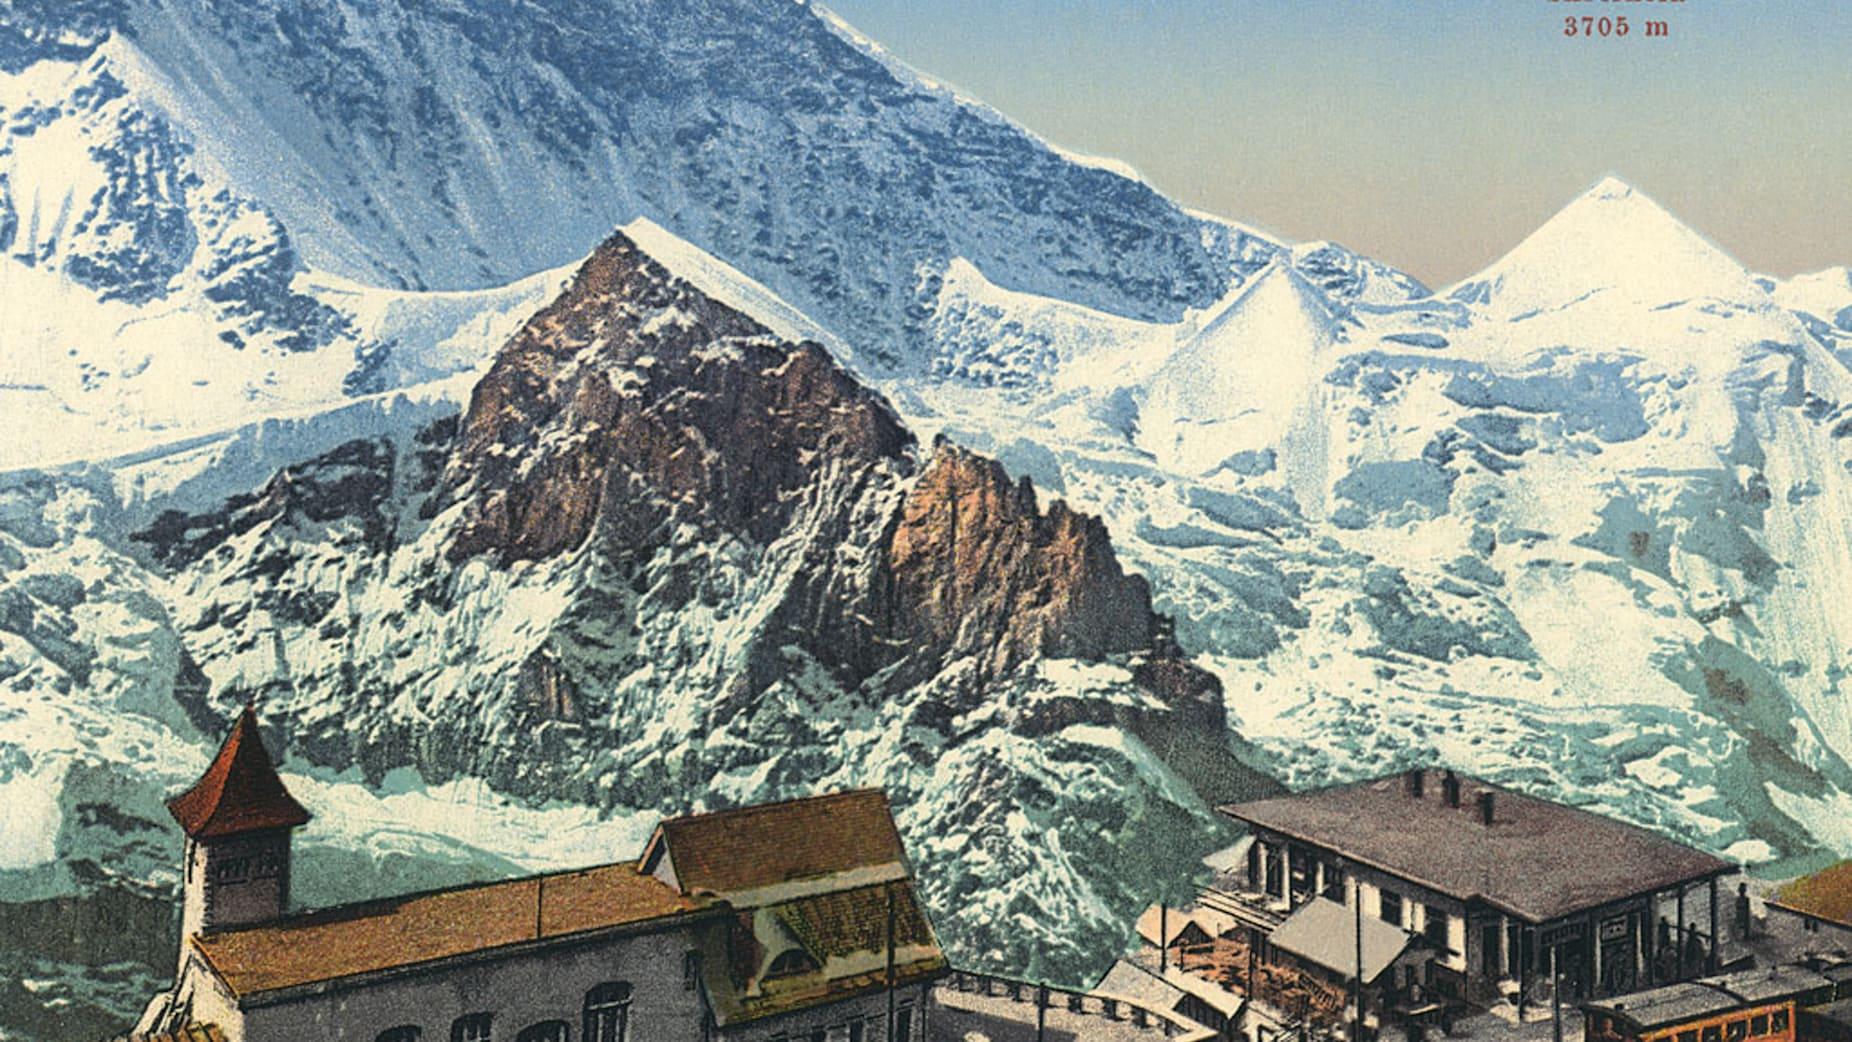 Bau der Jungfraubahn37